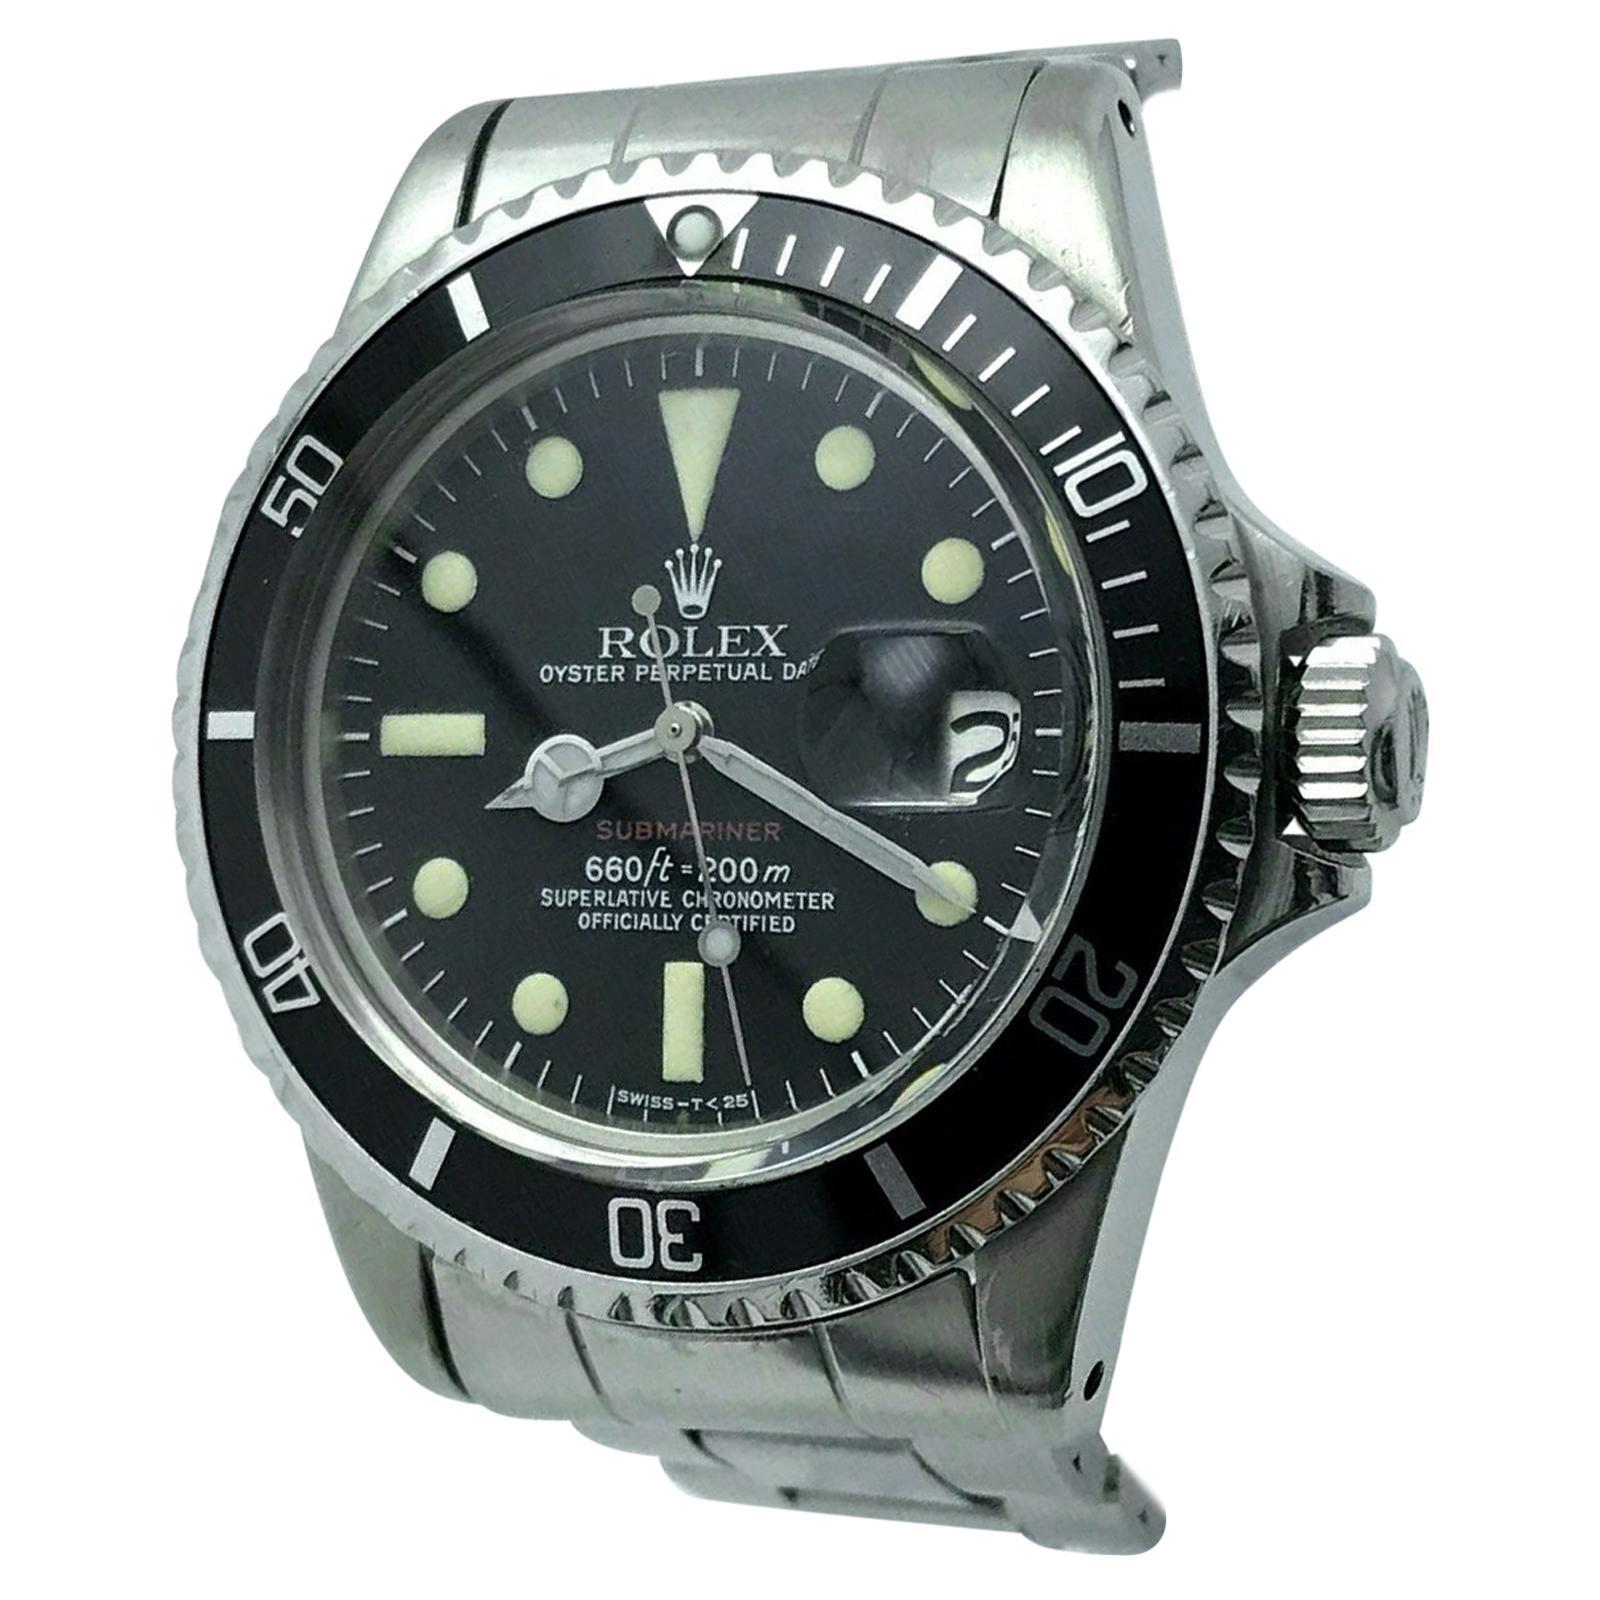 Vintage RED Rolex Submariner 1680 Stainless Steel 1973 Mark VI Dial 1973